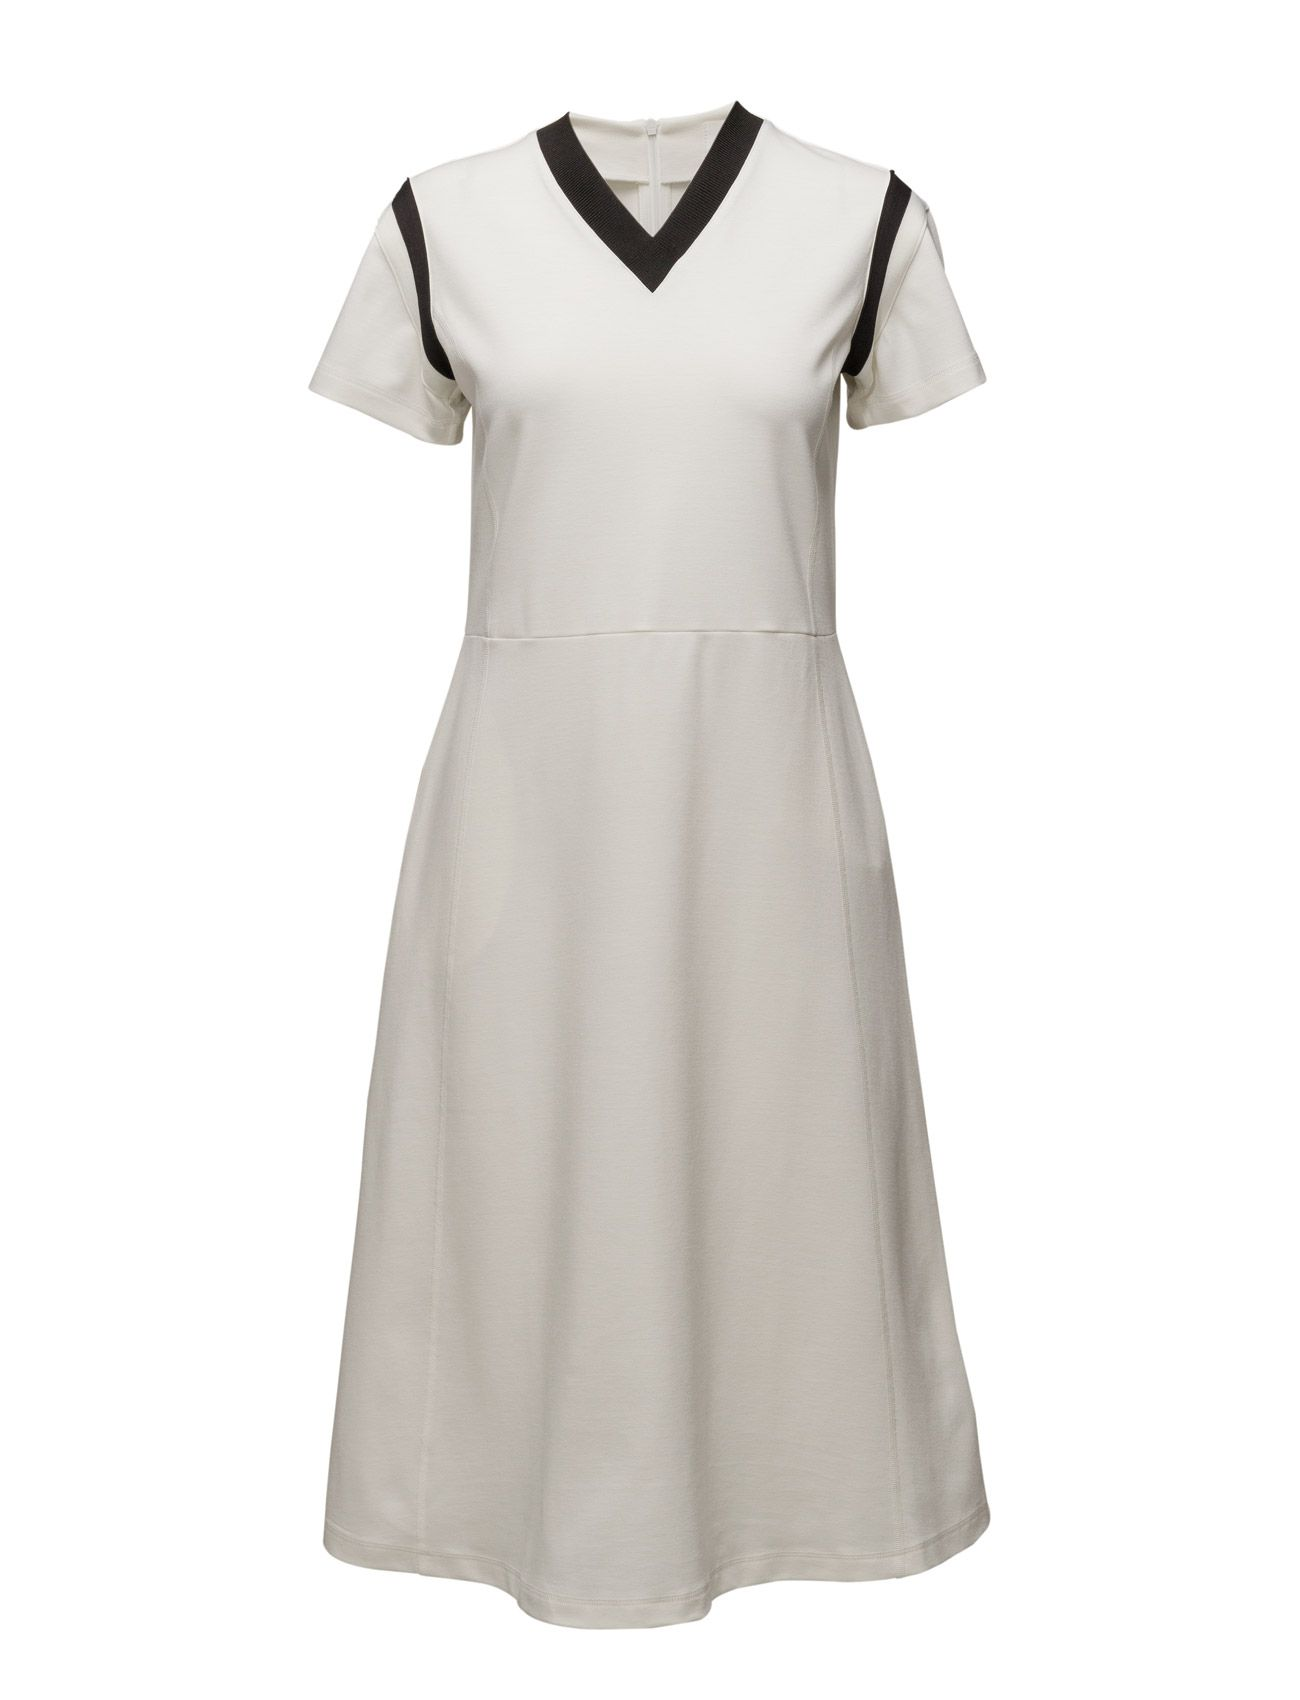 833990a4 770kr Wood Wood Blanche dress | Wear | Midi kjoler, Kjoler